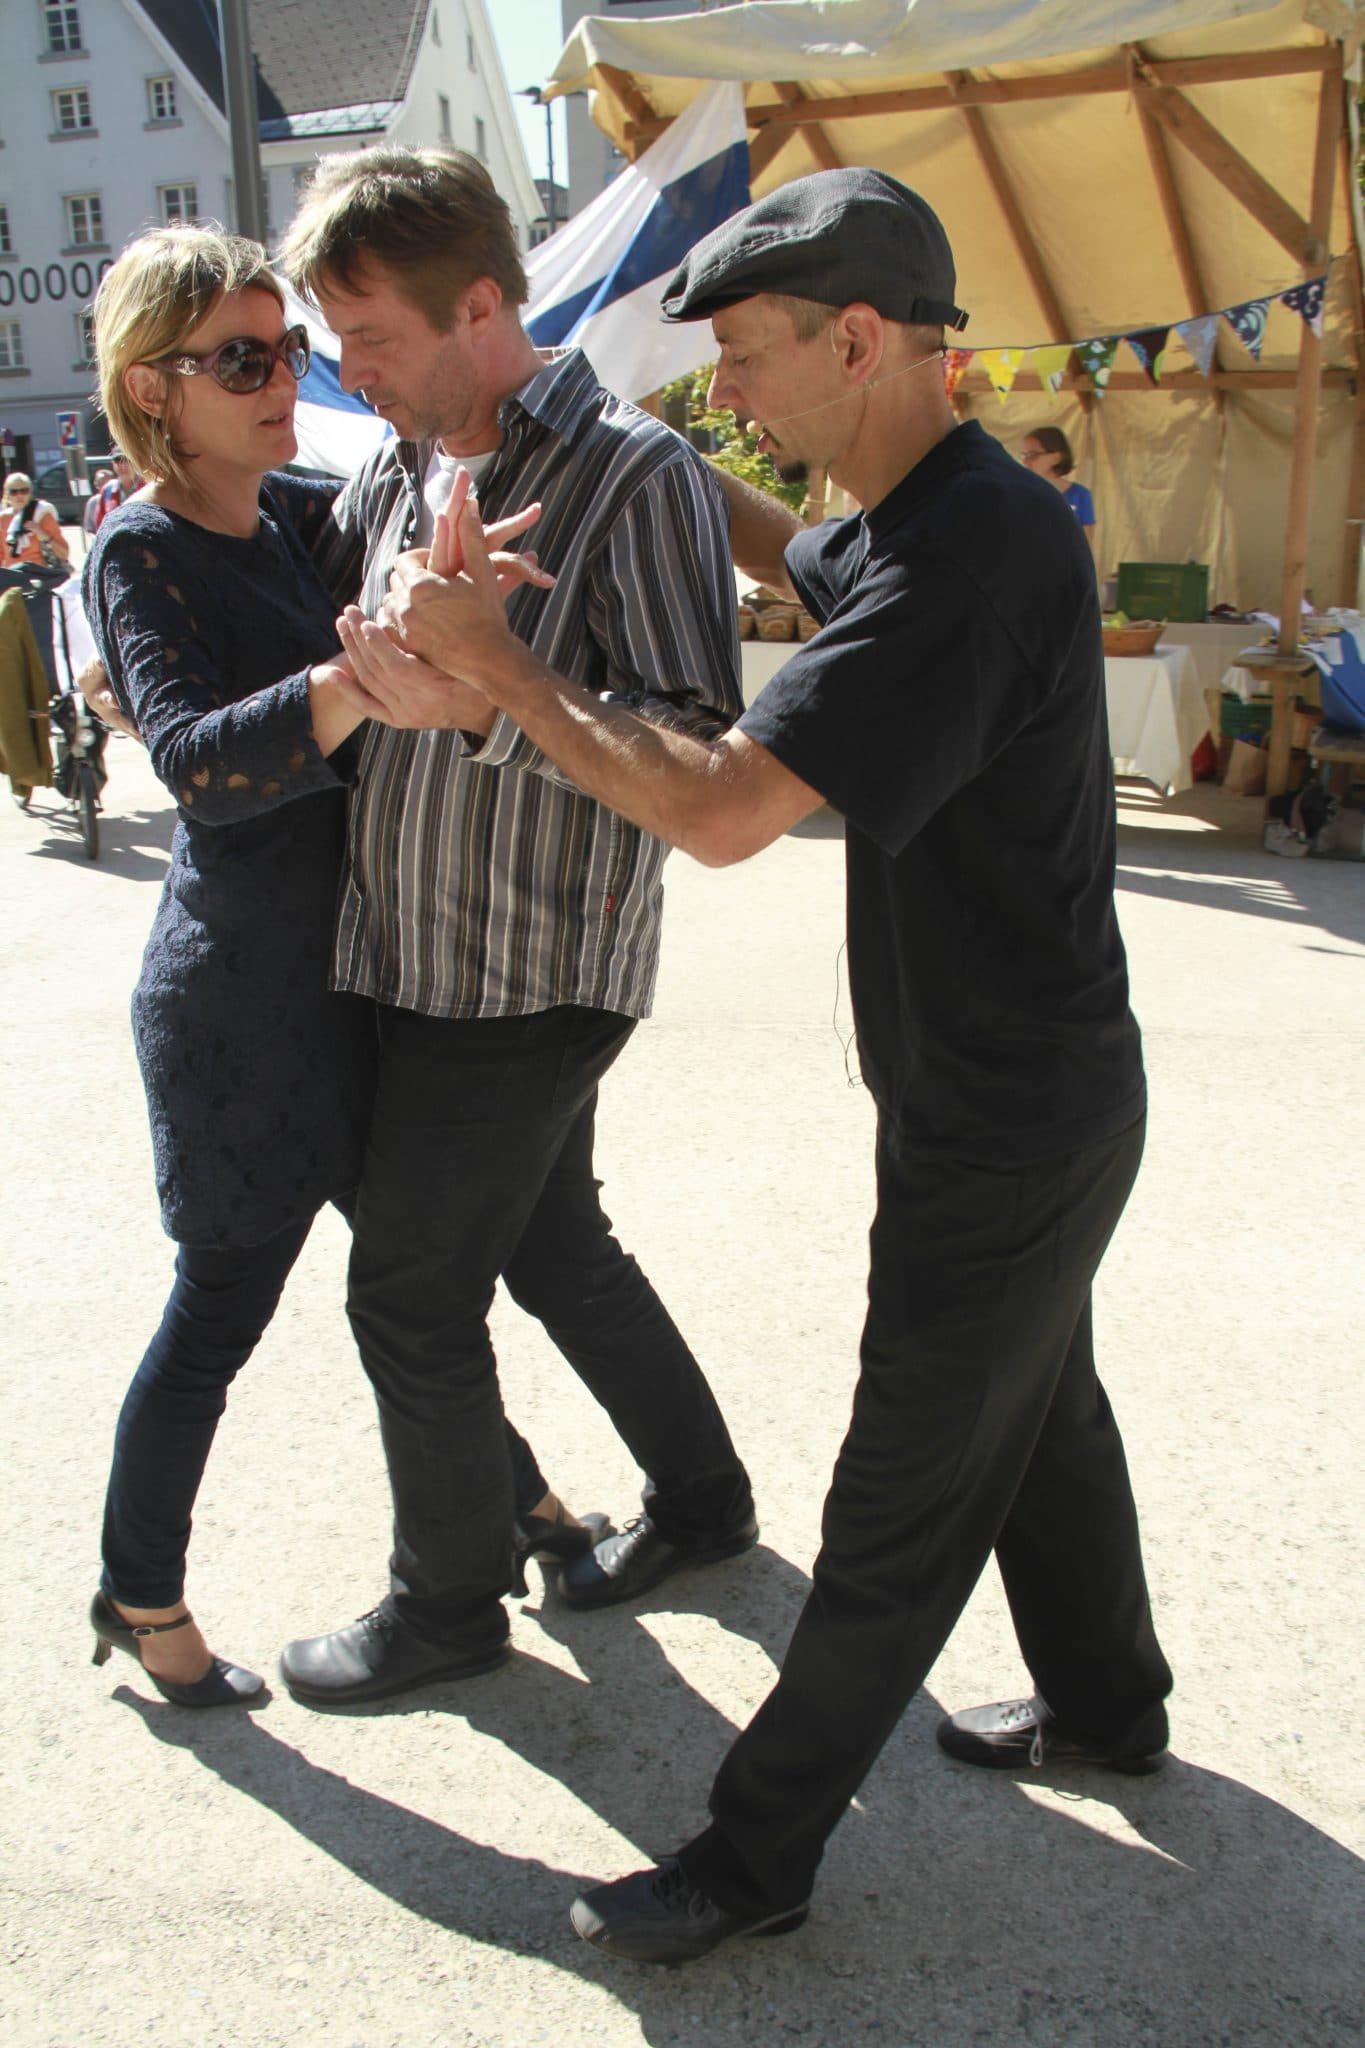 tanzkurs am kornmarktplatz